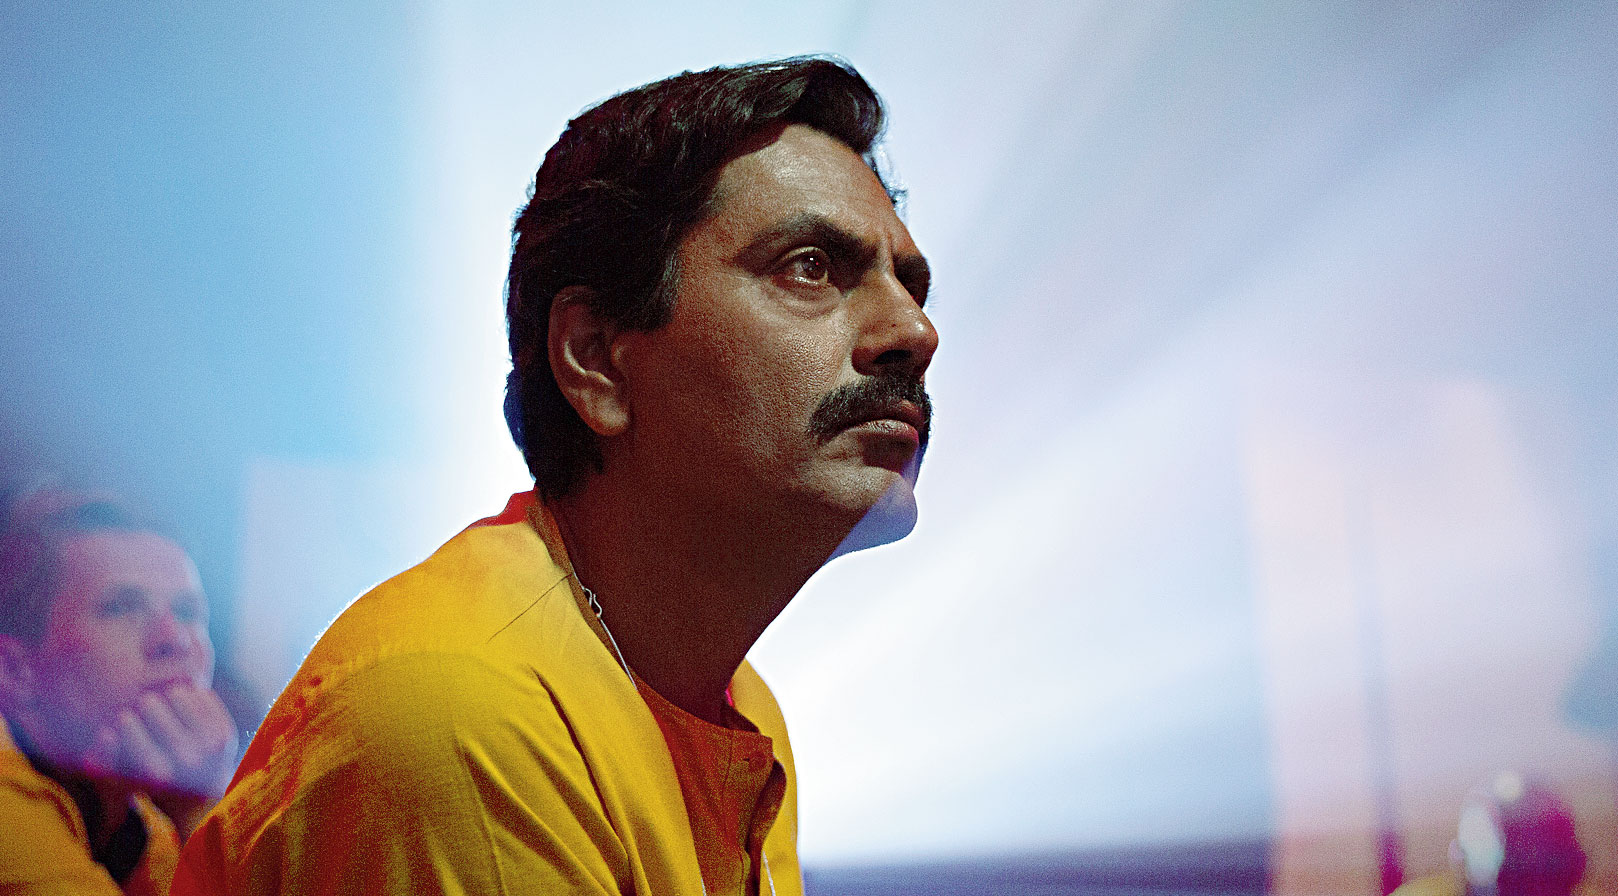 Nawazuddin Siddiqui in Sacred Games Season 2